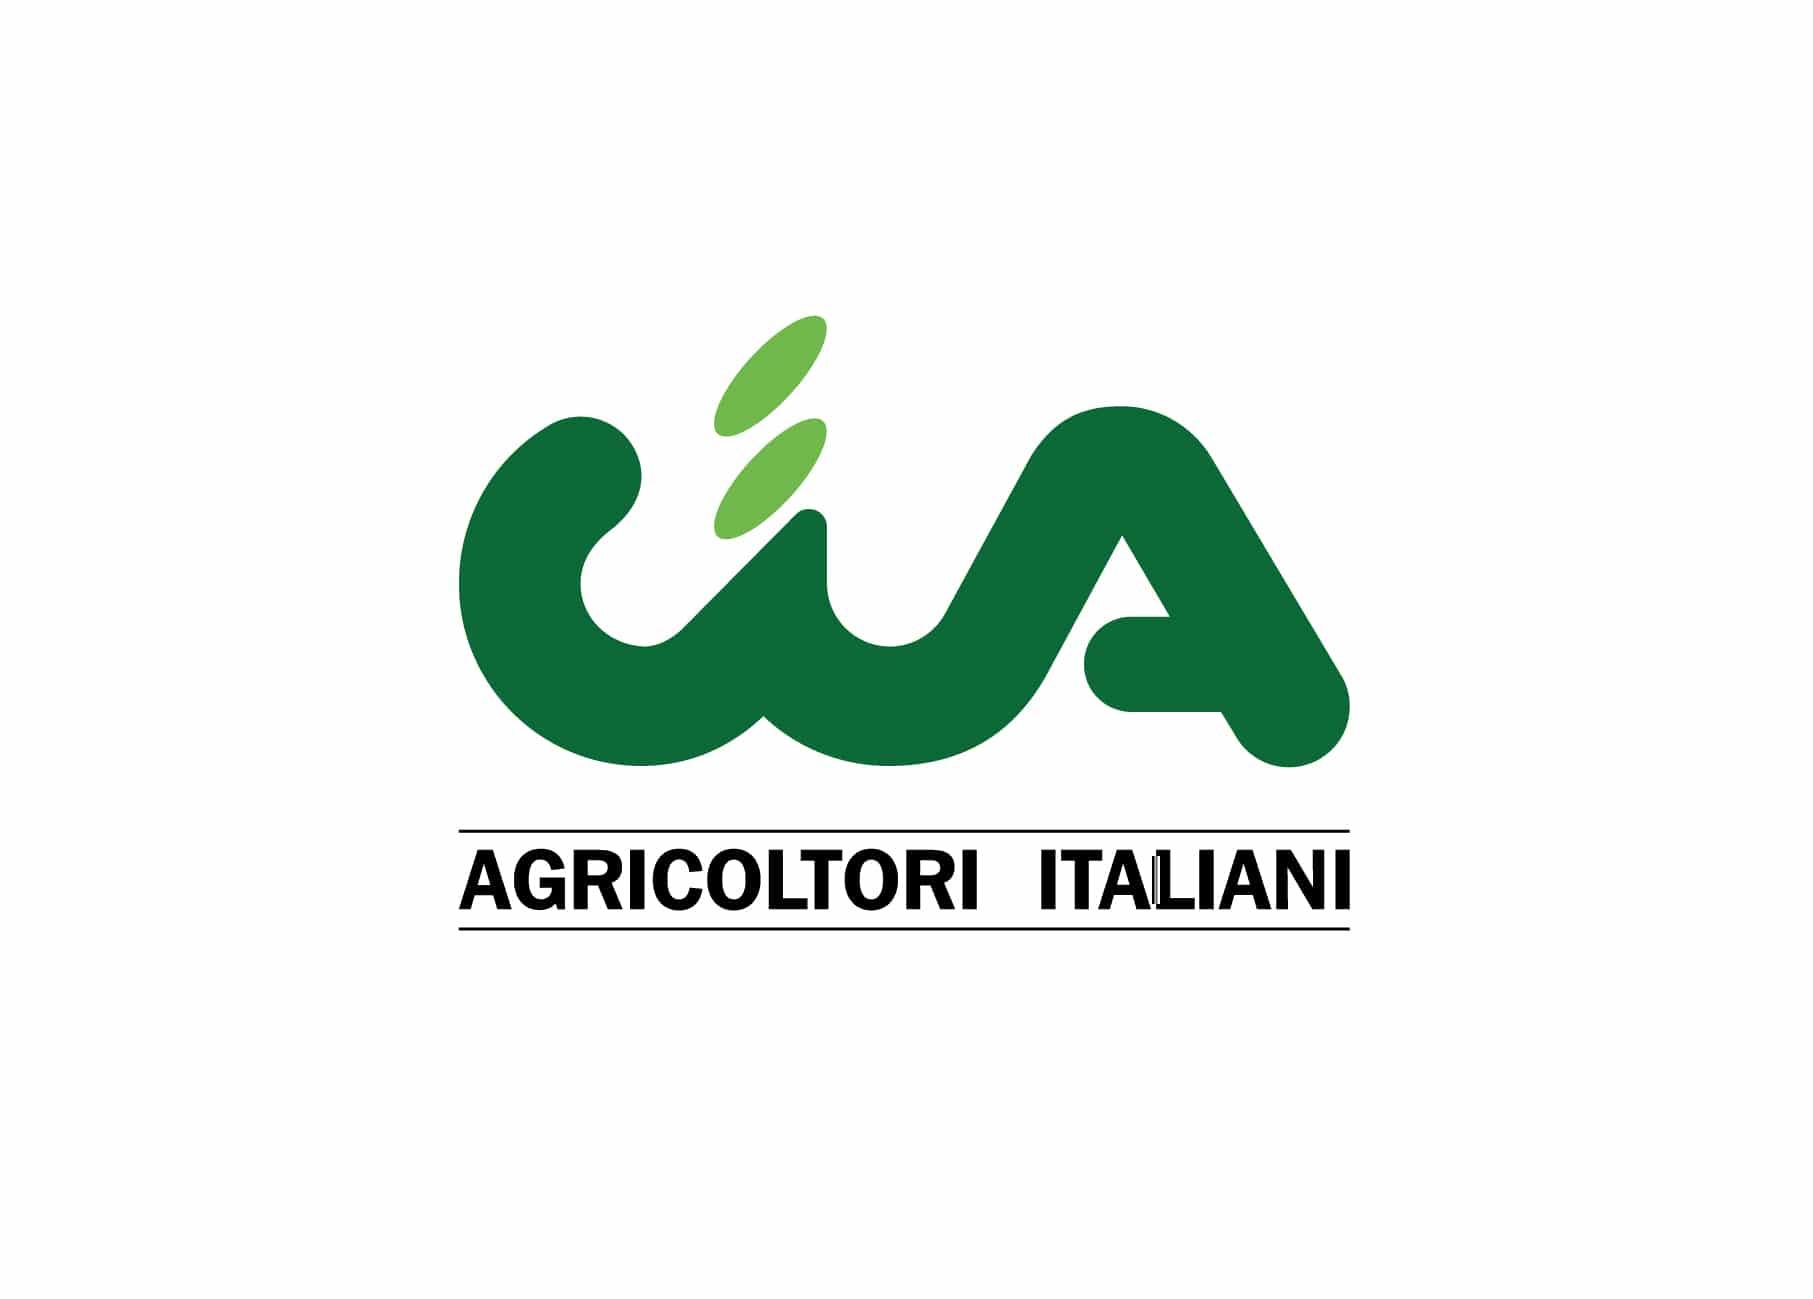 Logo Cia AGRICOLTORI ITALIANI